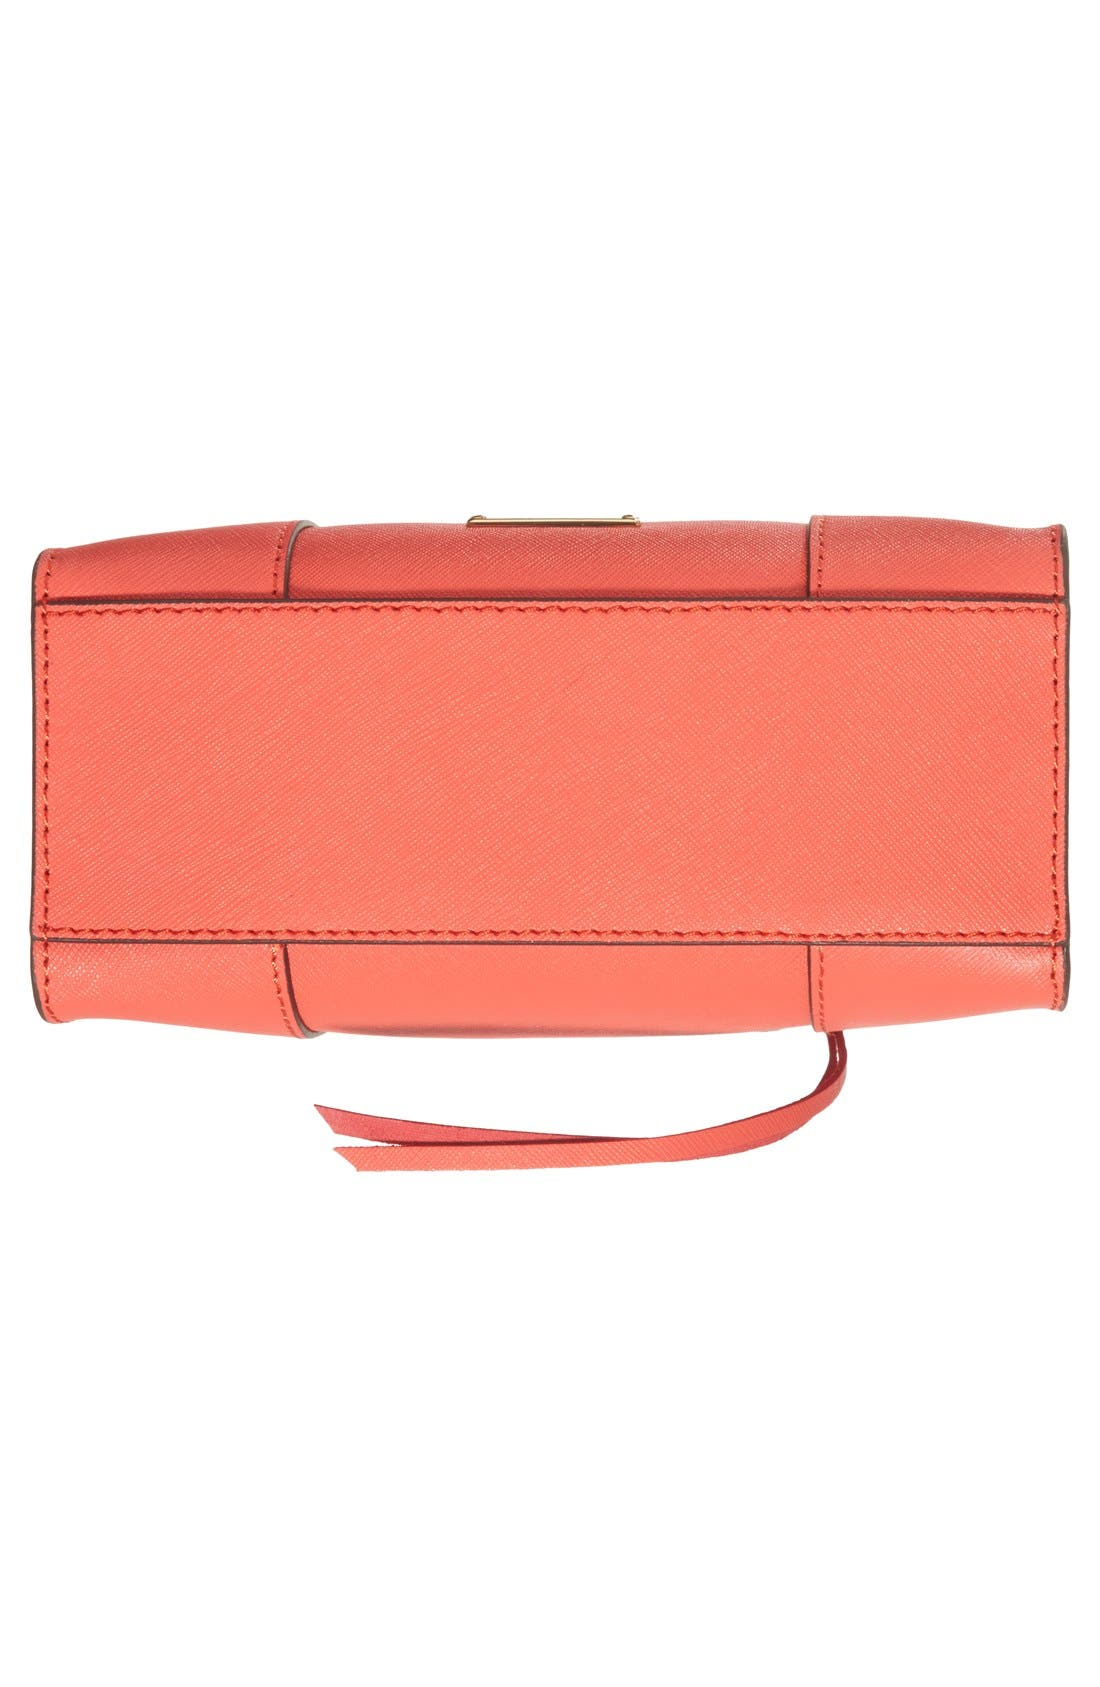 ,                             'Mini MAB Tote' Crossbody Bag,                             Alternate thumbnail 141, color,                             801